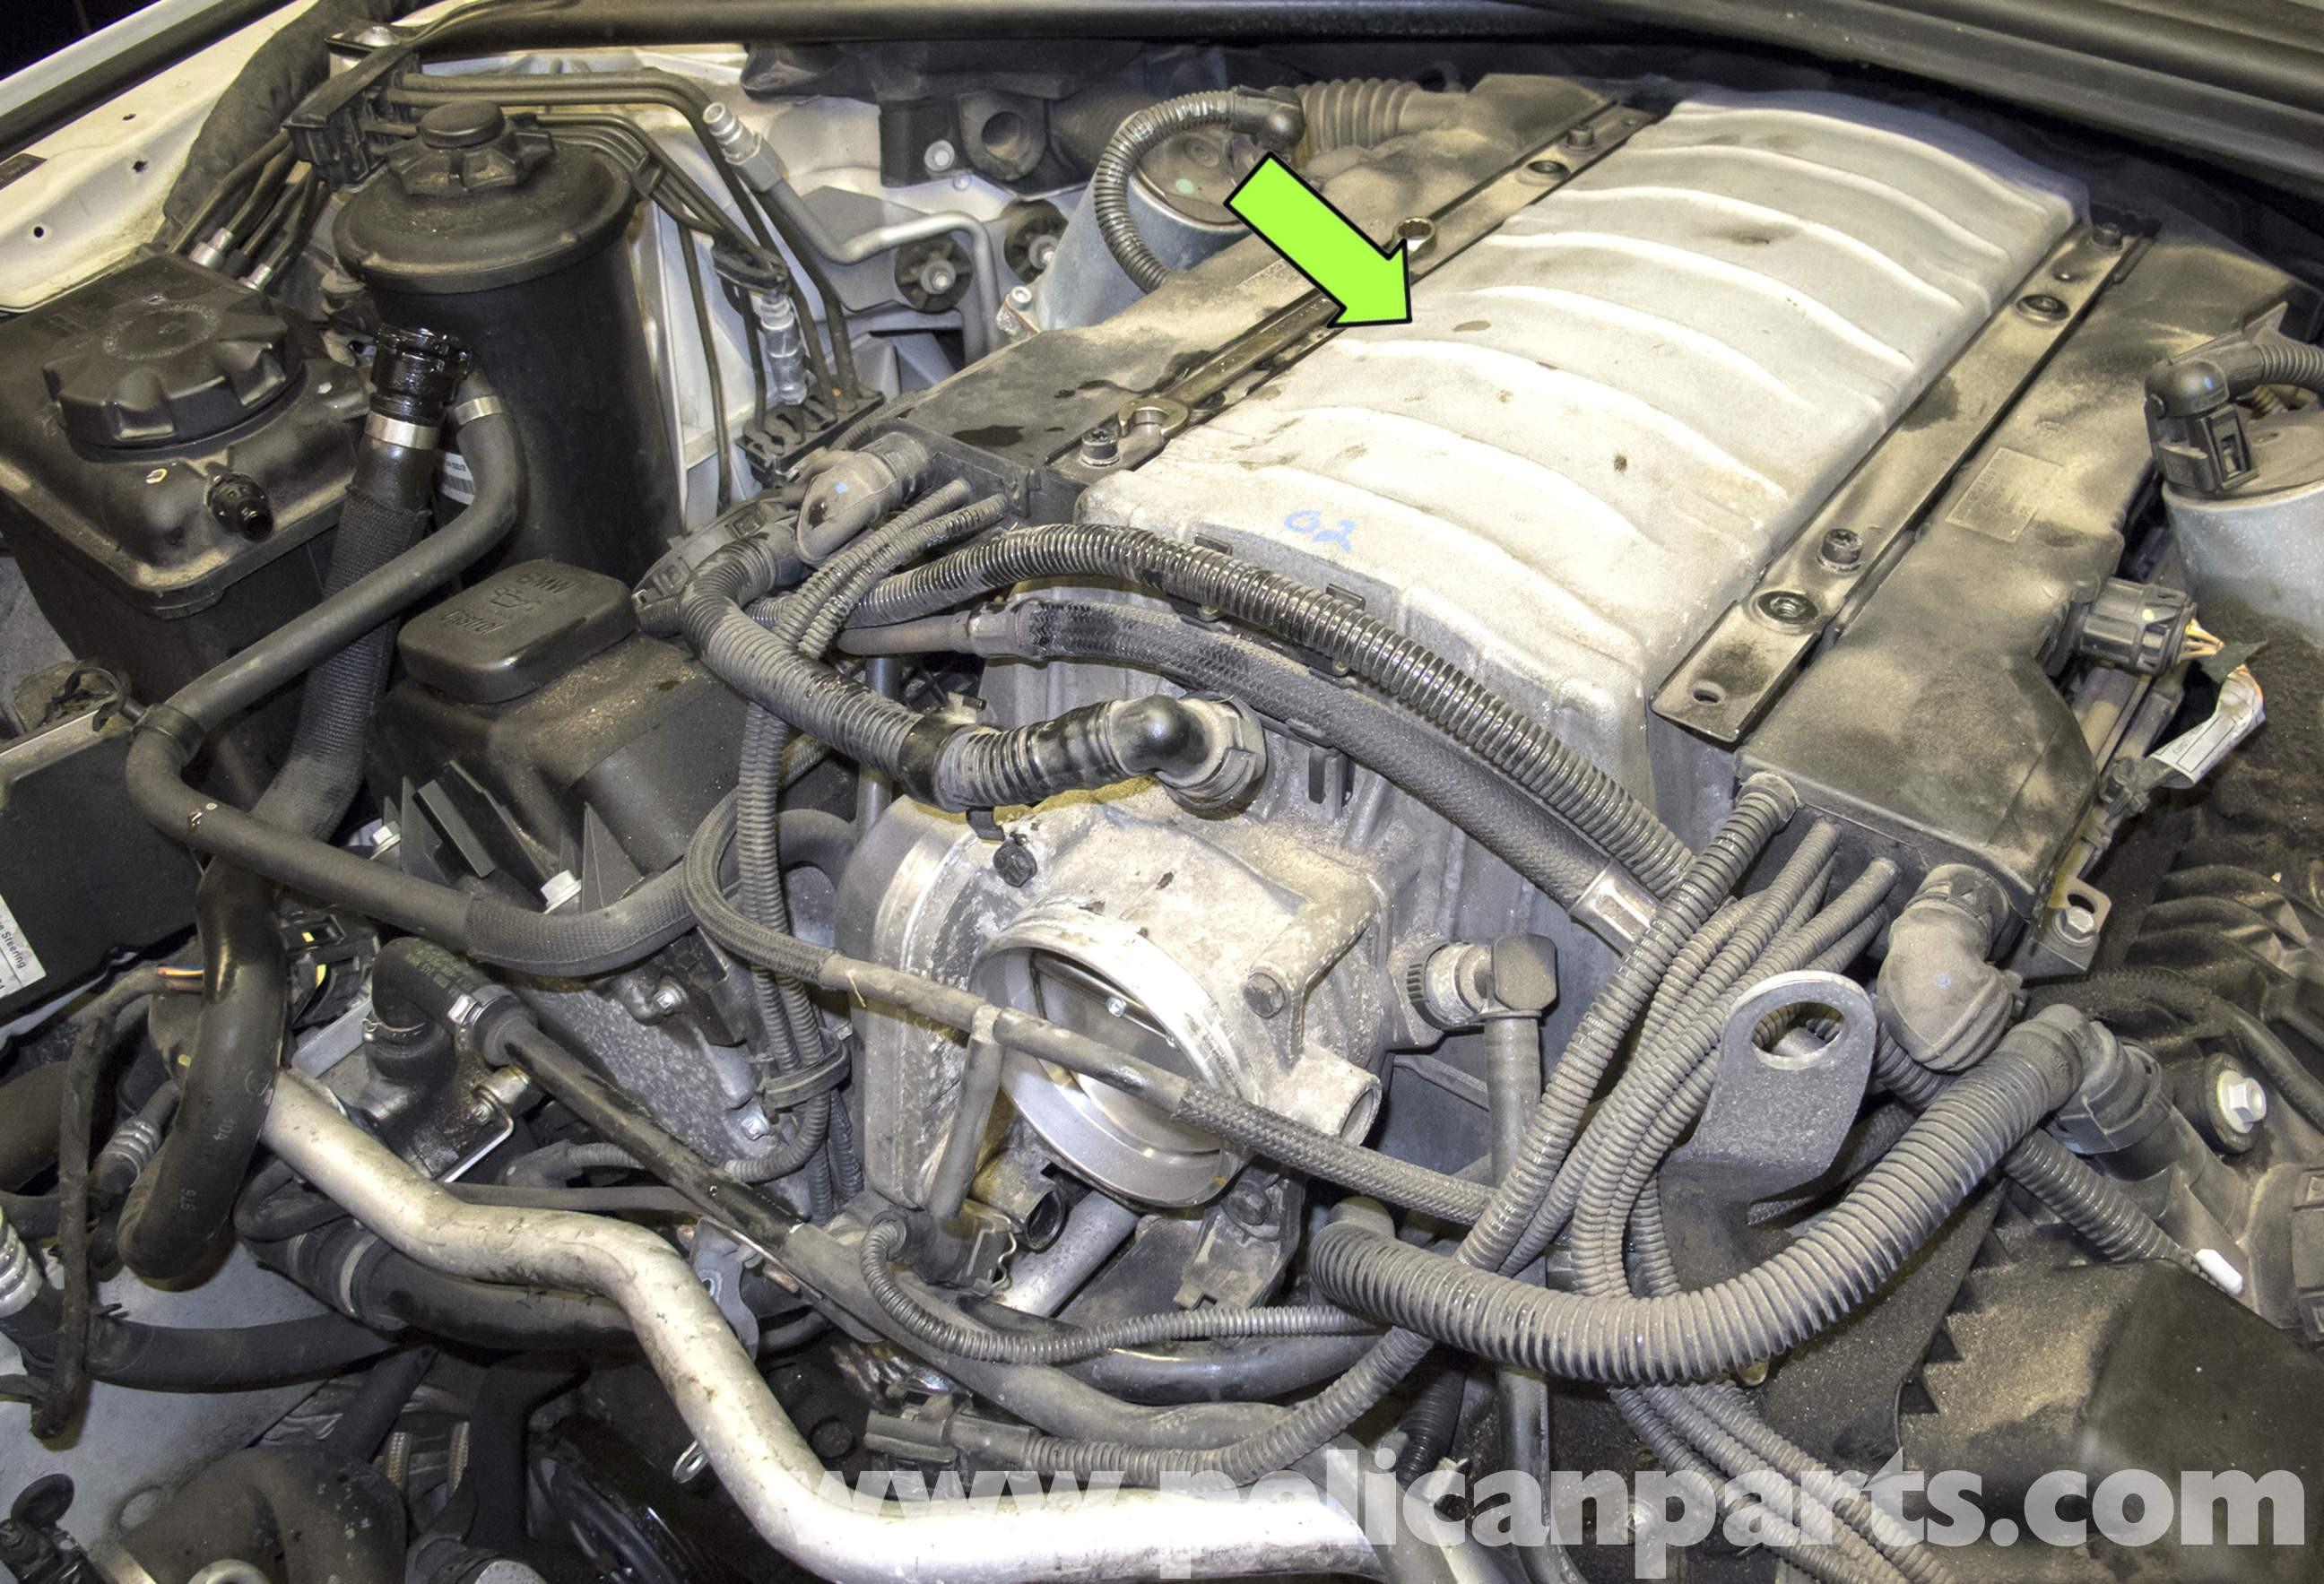 Bmw 745i Engine Diagram Engine Wiring Bmw Engine Wiring Harness Diagram E Diagrams Of Bmw 745i Engine Diagram Engine Wiring Bmw Engine Wiring Harness Diagram E Diagrams